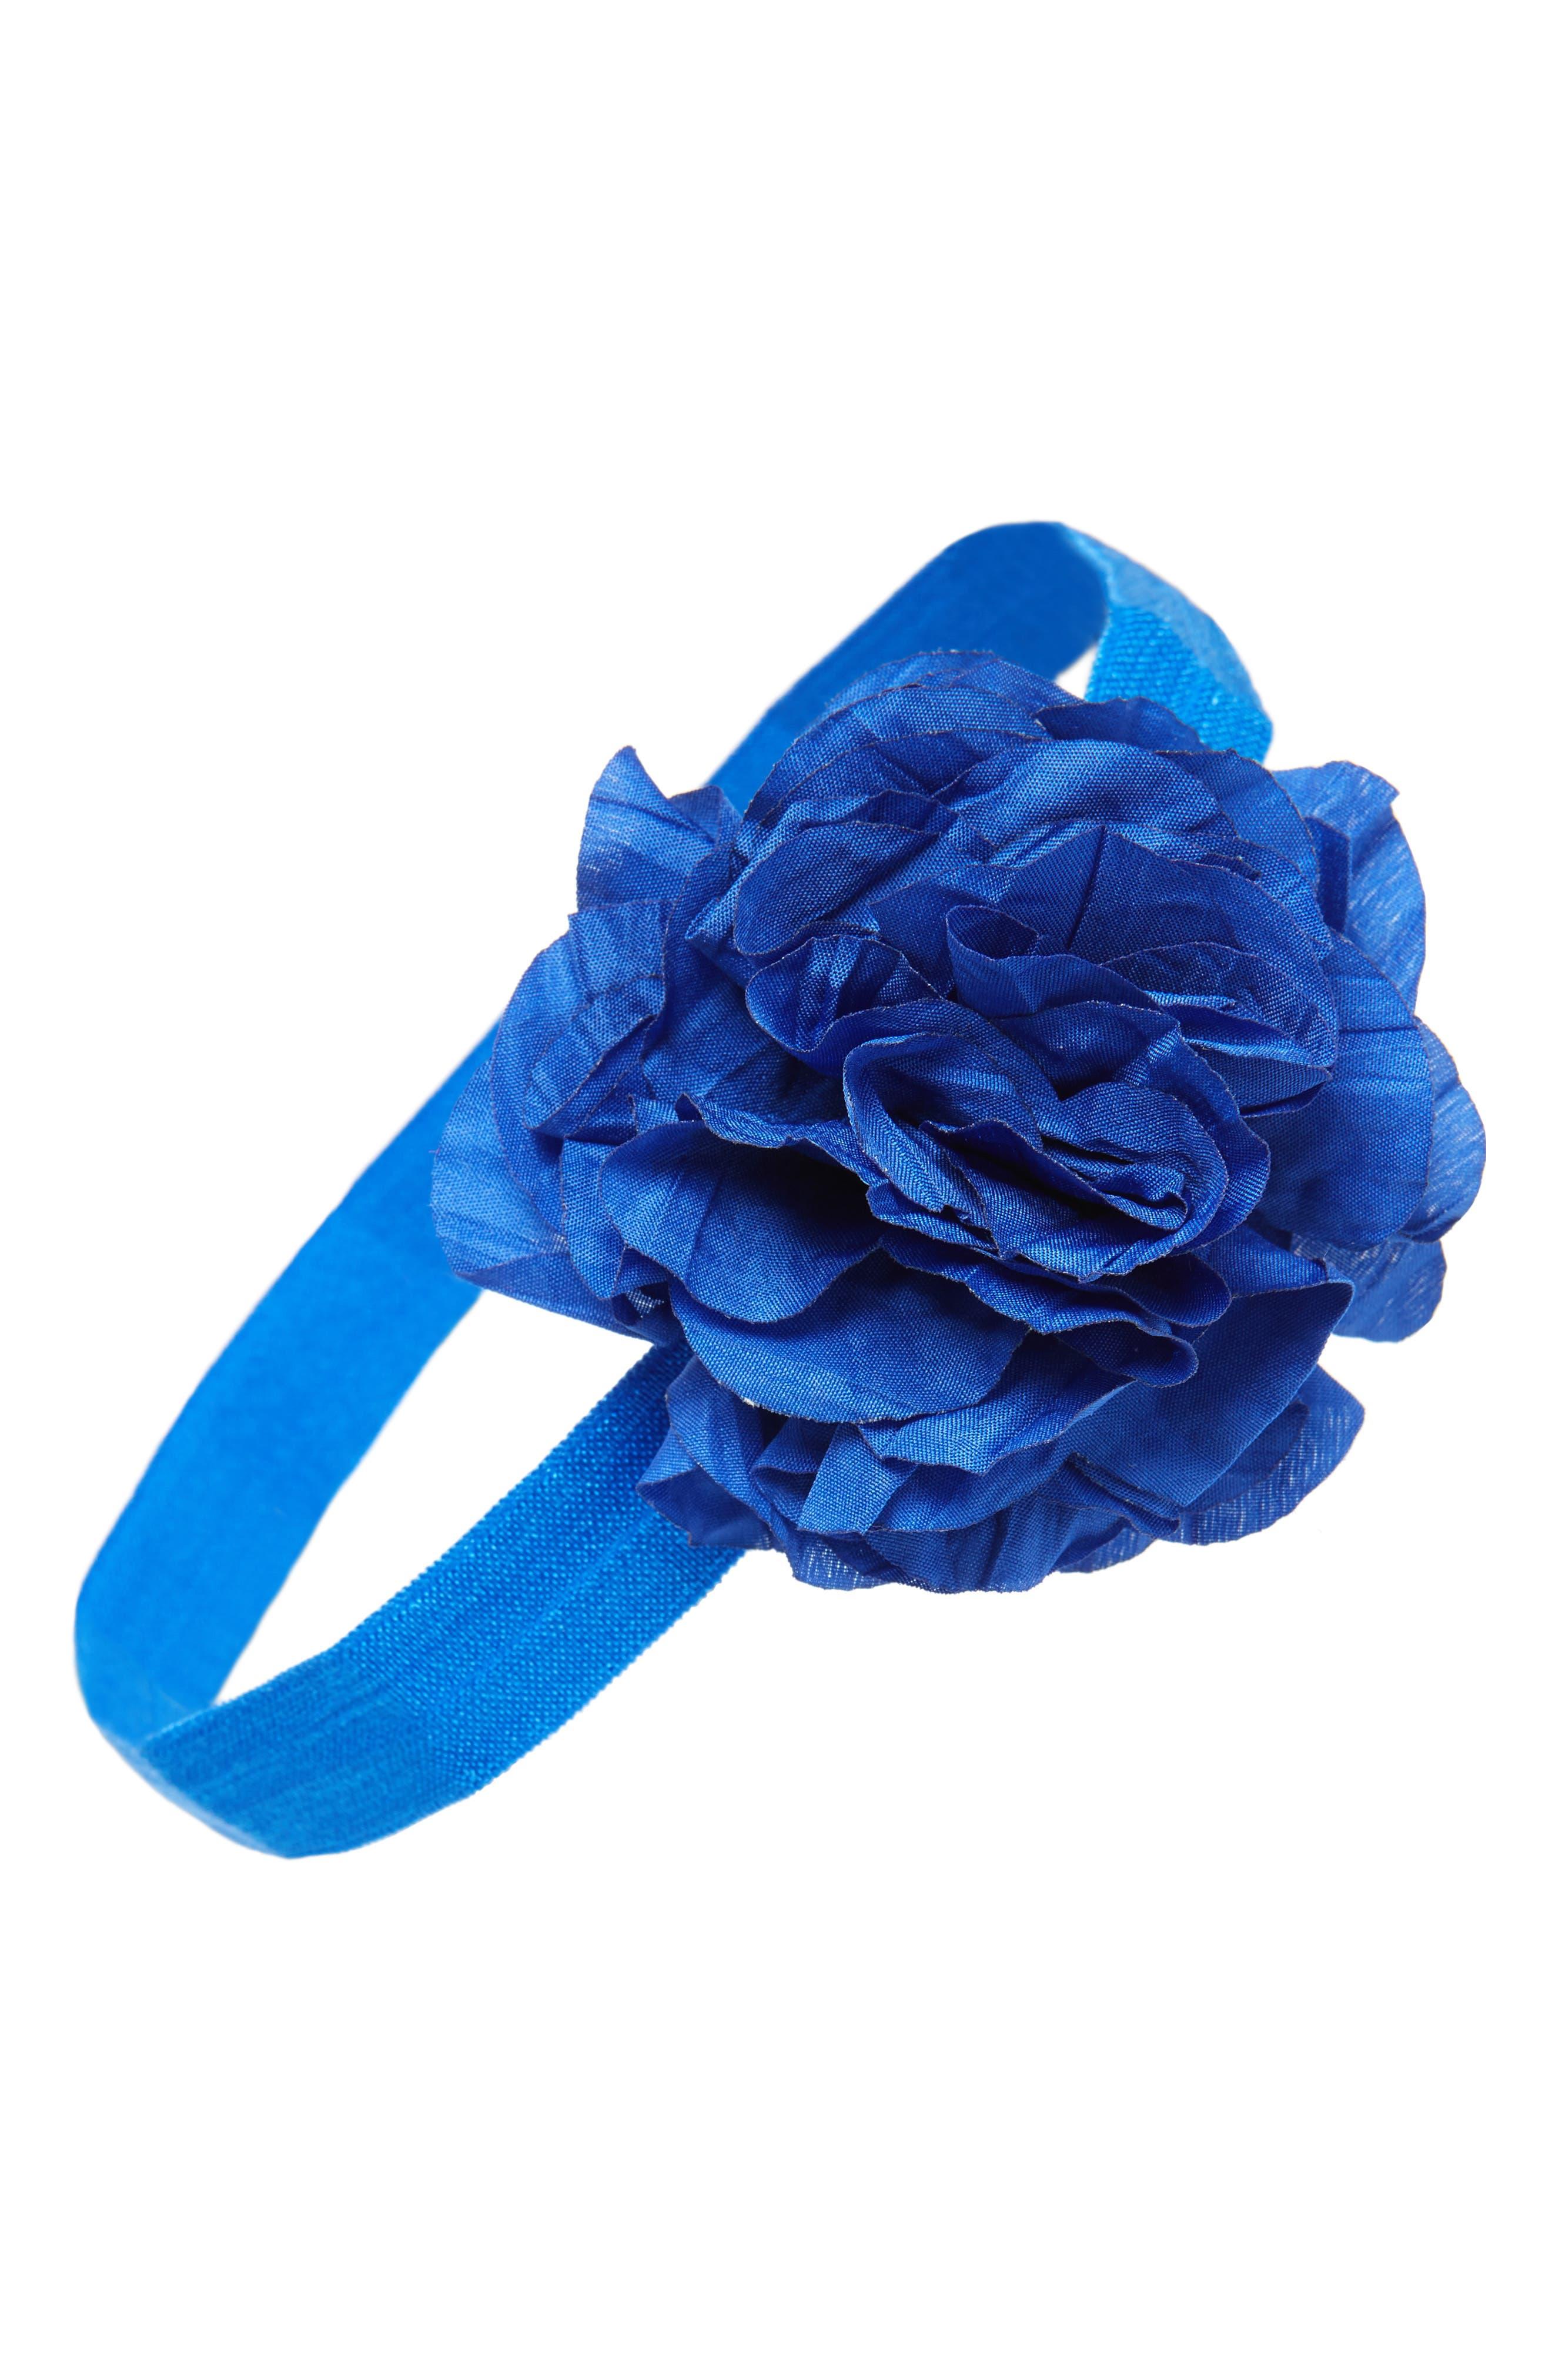 Flower Headband,                             Main thumbnail 1, color,                             410